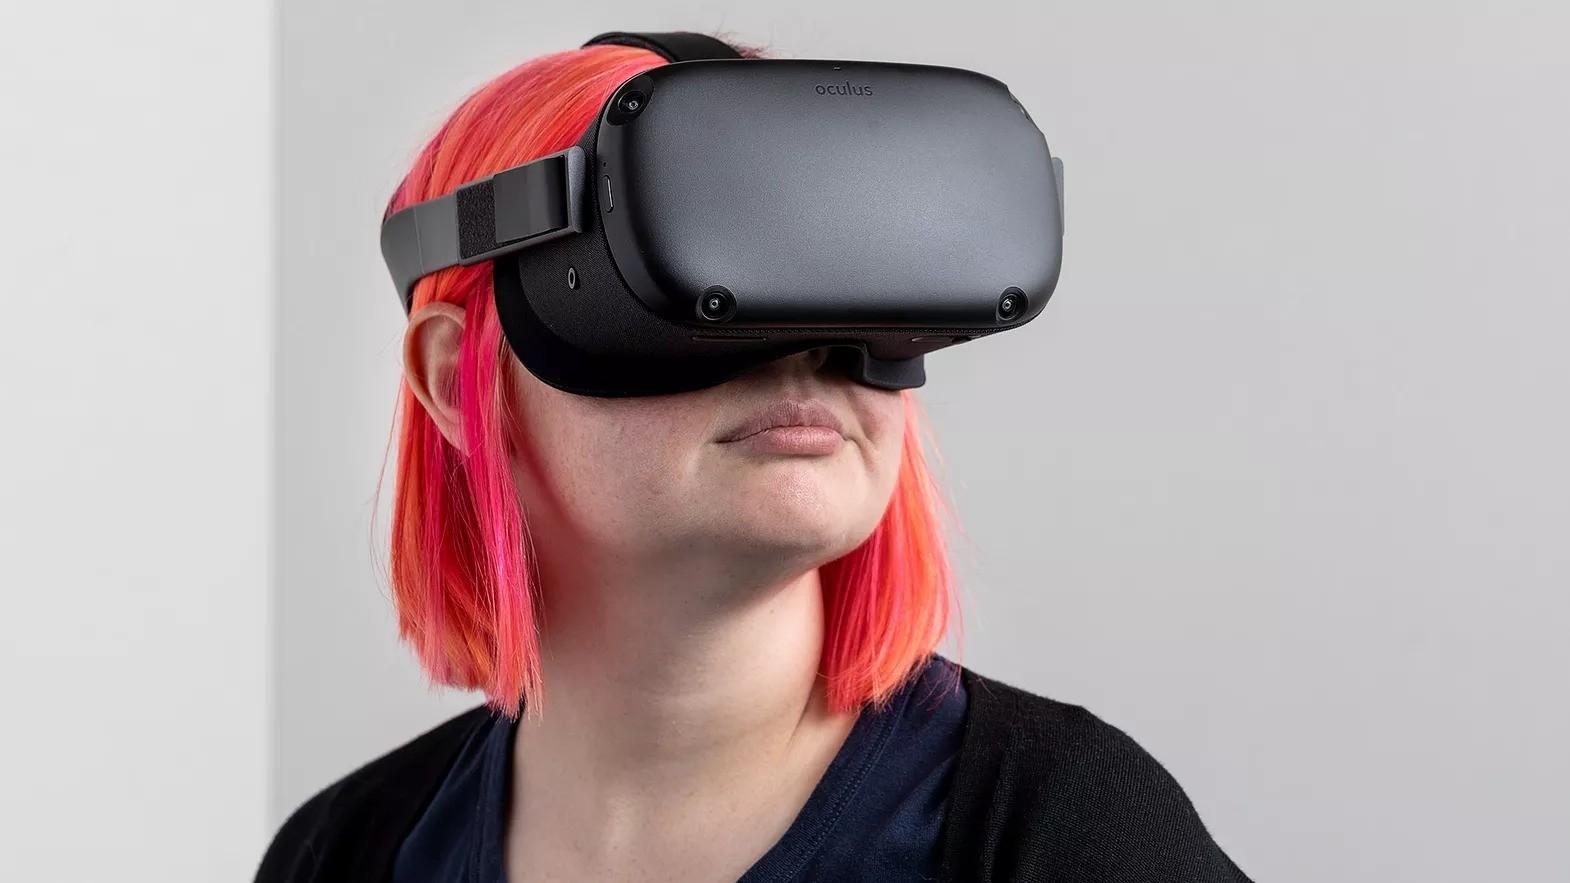 AMUSEMENTS : VR / AR, THEME PARKS, VIDEO + ARCADE GAMES NEWS - cover